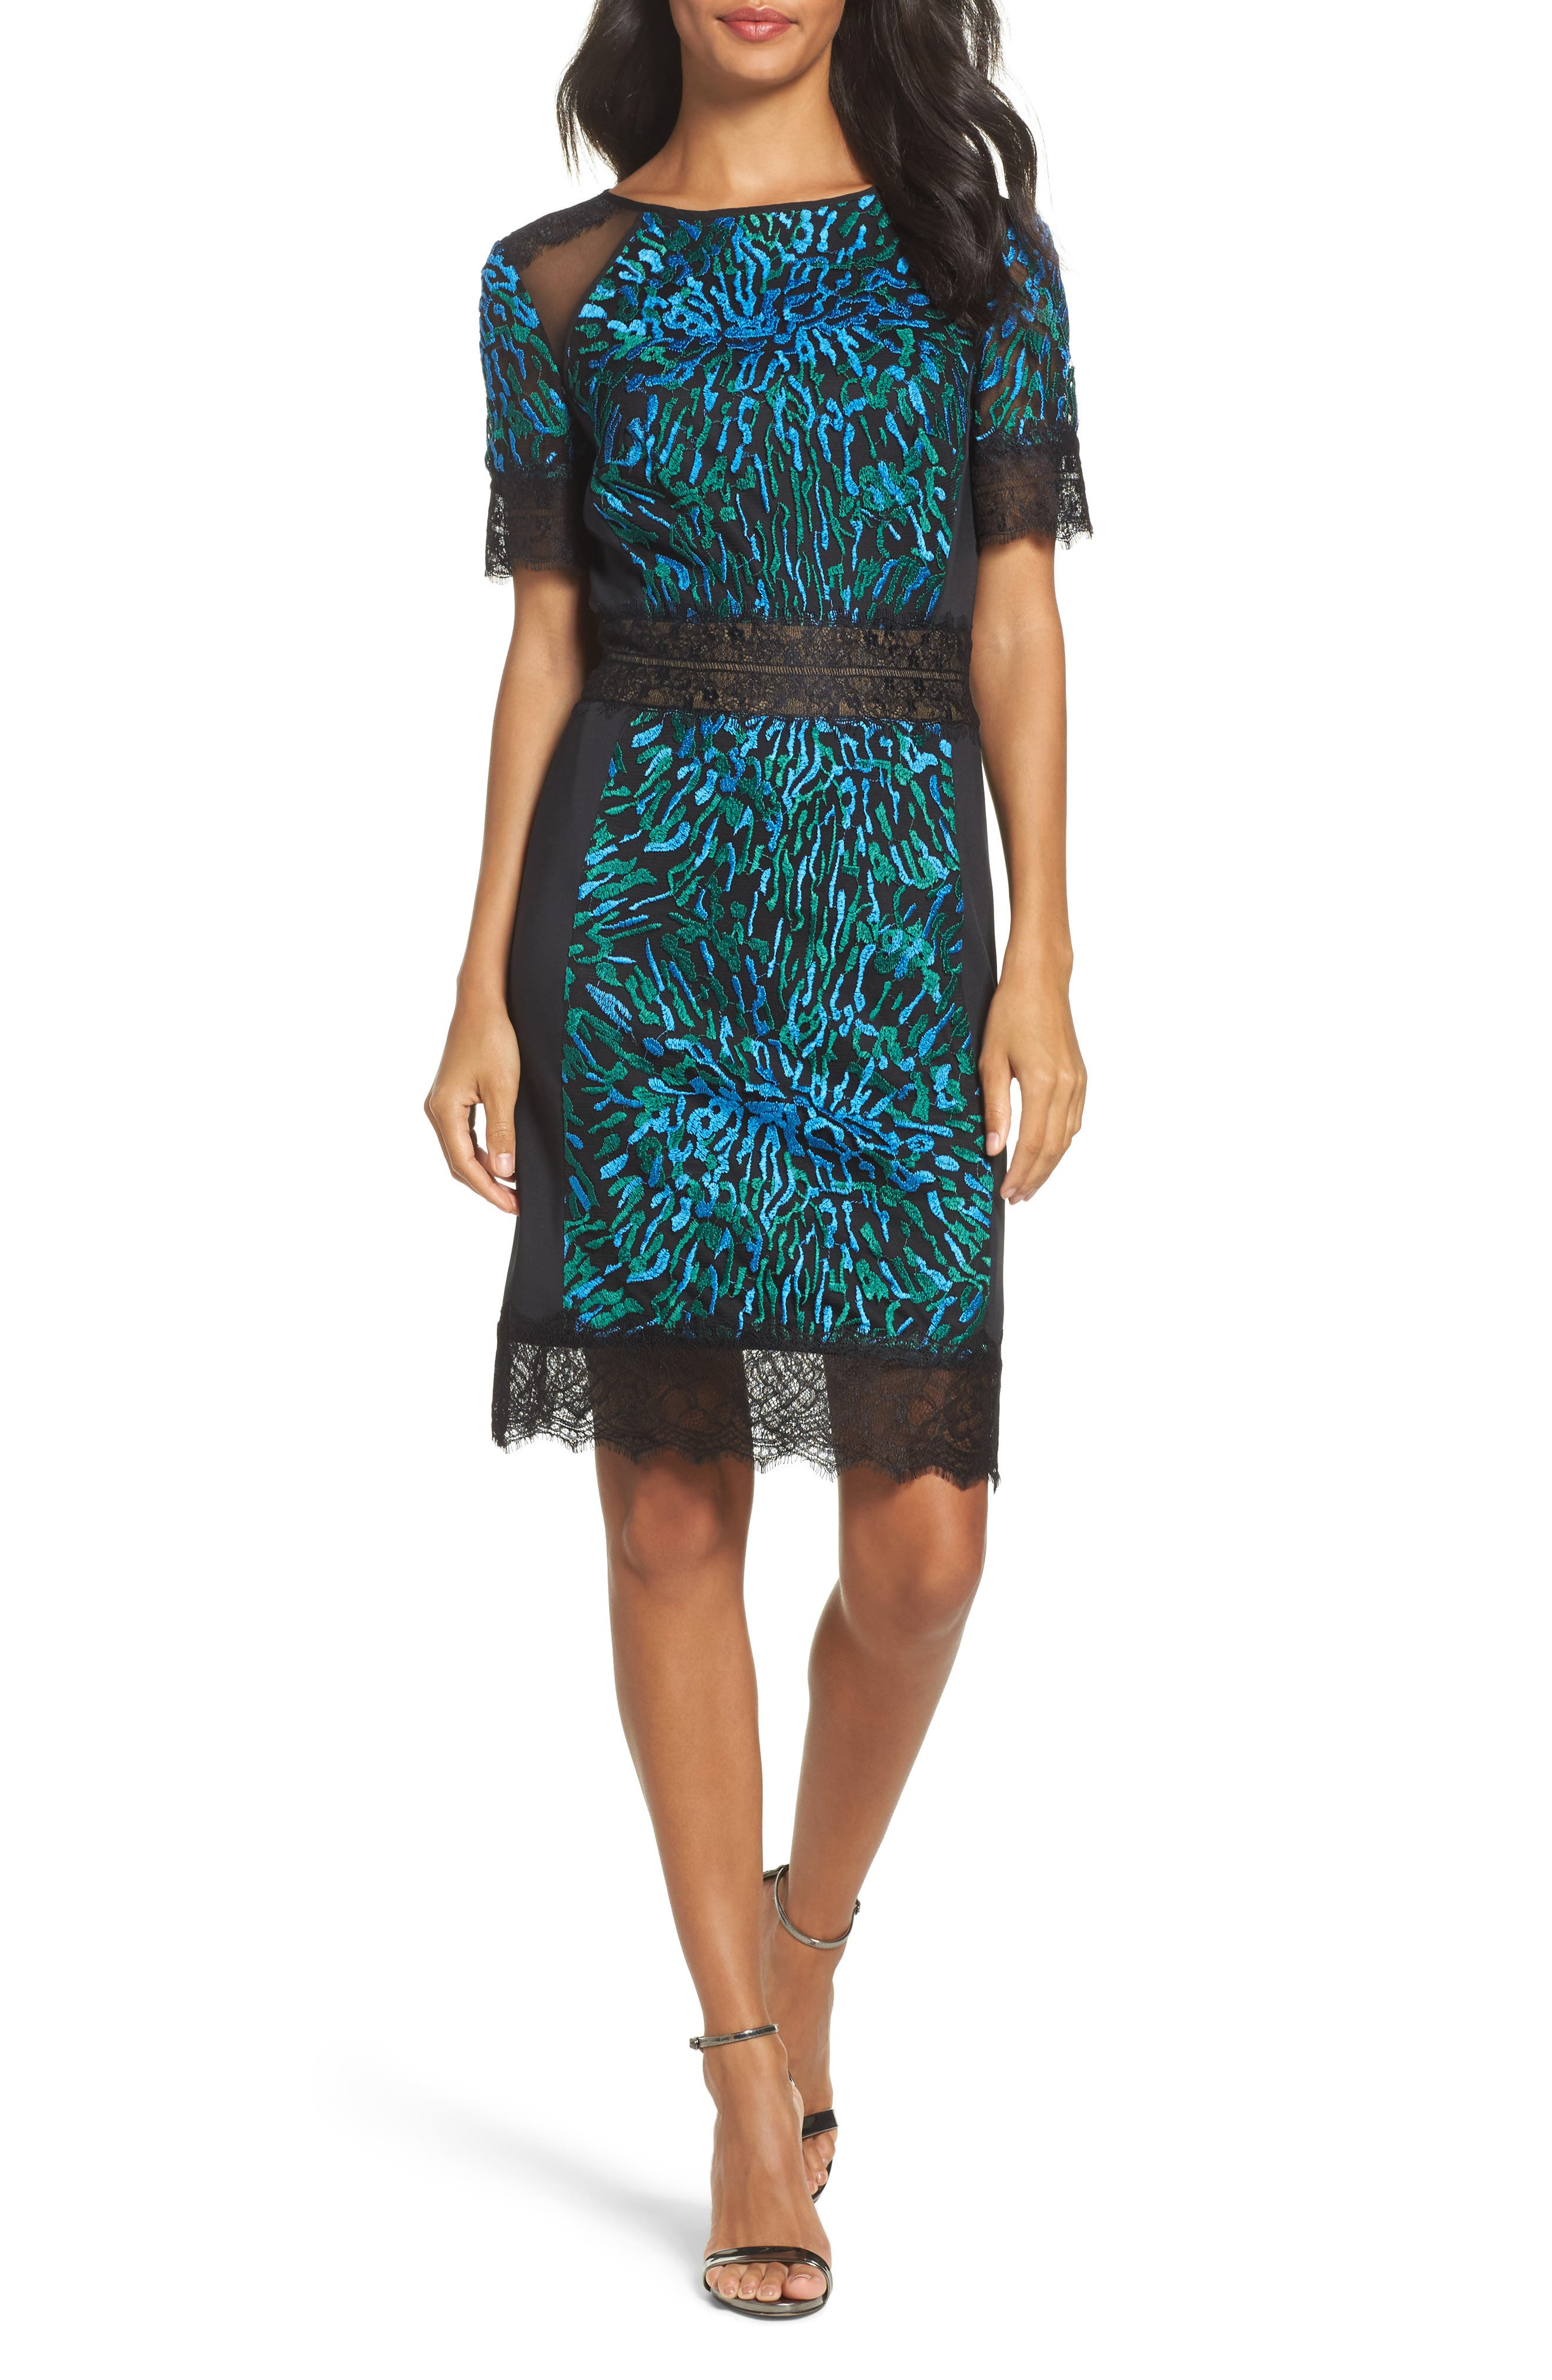 Alternate Image 1 Selected - Tadashi Shoji Illusion Lace & Embroidered Mesh Sheath Dress